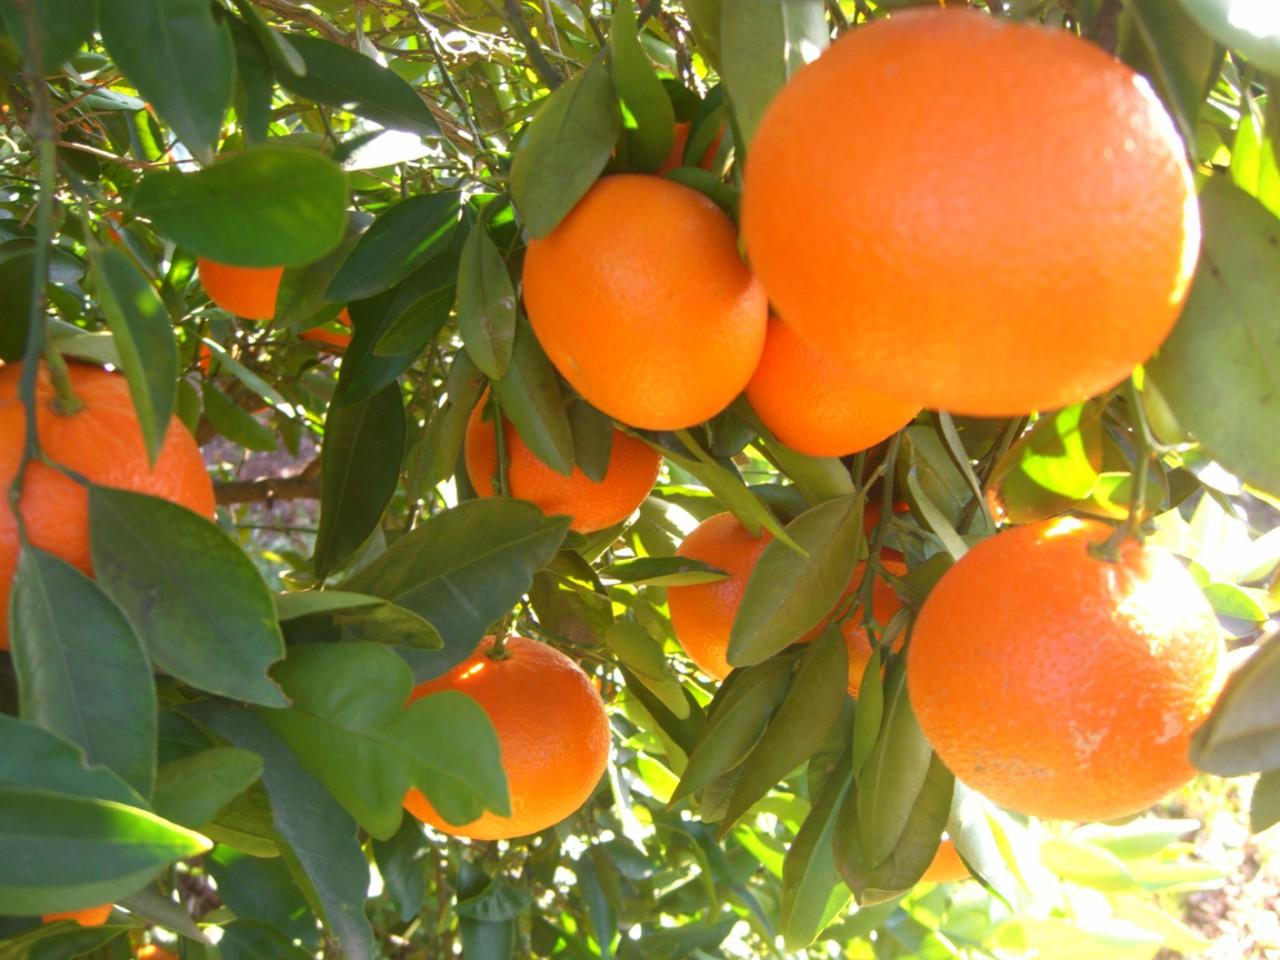 Desafío en Mandarinos